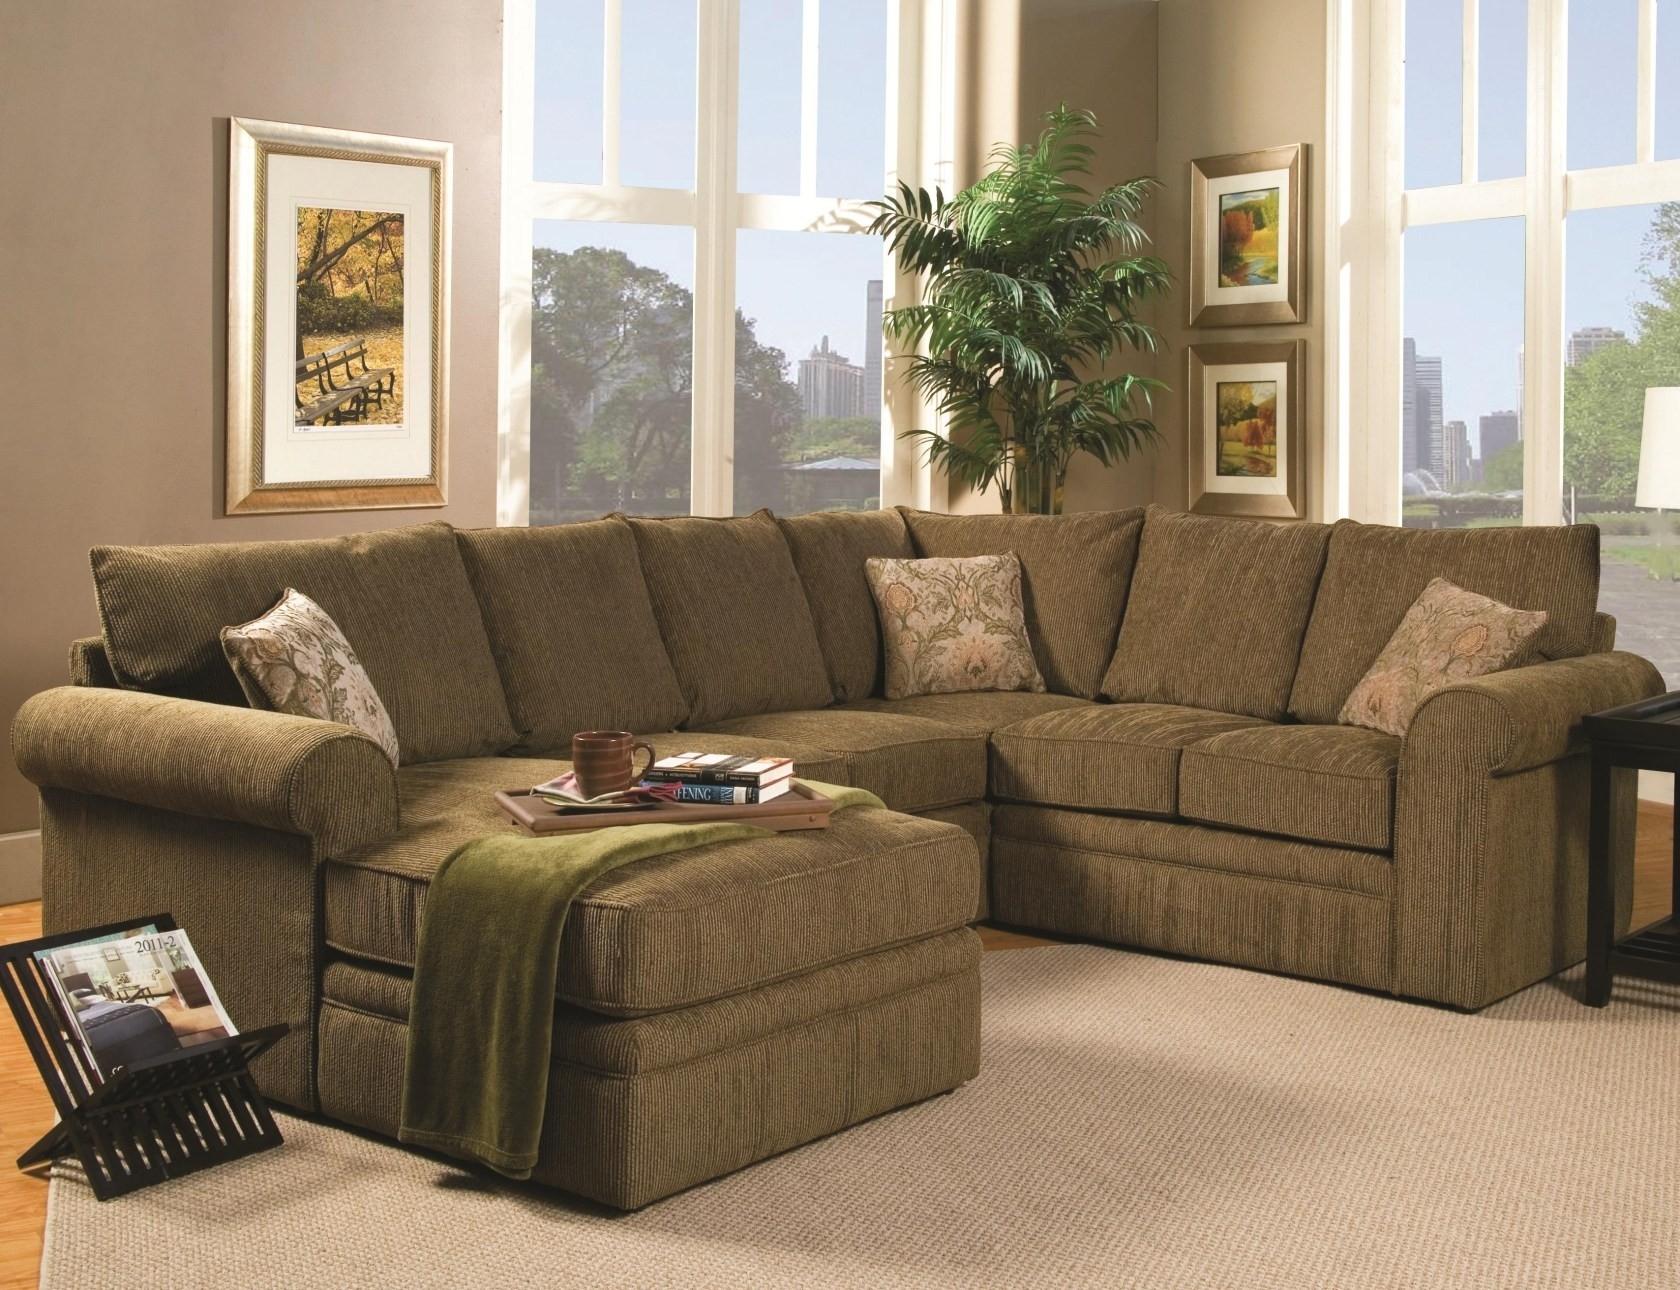 Sectional Sofas Charlotte Nc – Hotelsbacau Intended For Sectional Sofas At Charlotte Nc (View 8 of 10)